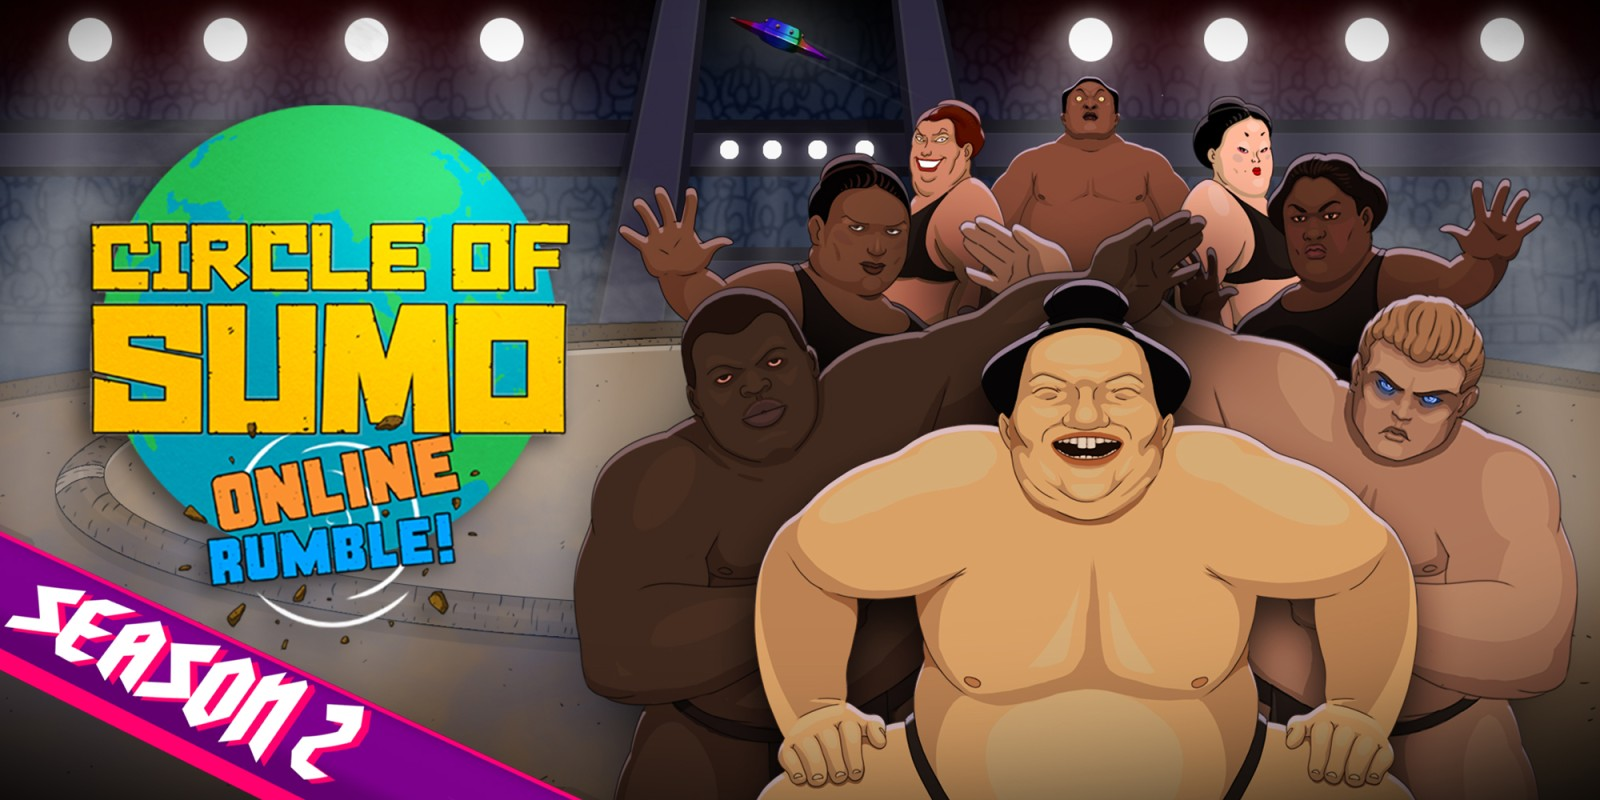 Circle of Sumo: Online Rumble!